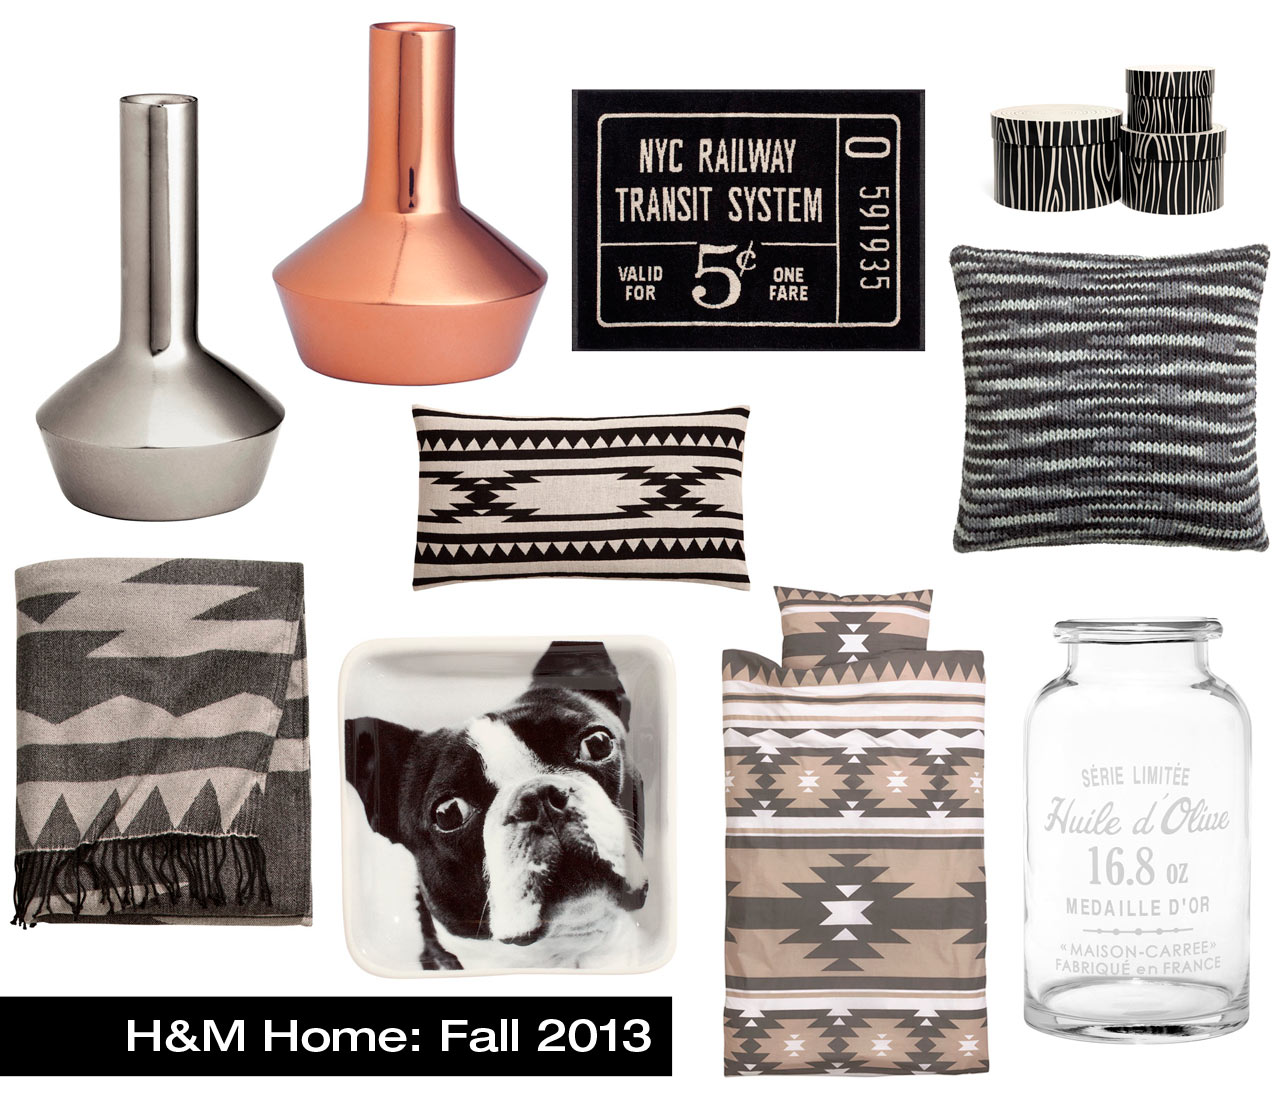 H&M Home Finally Online!